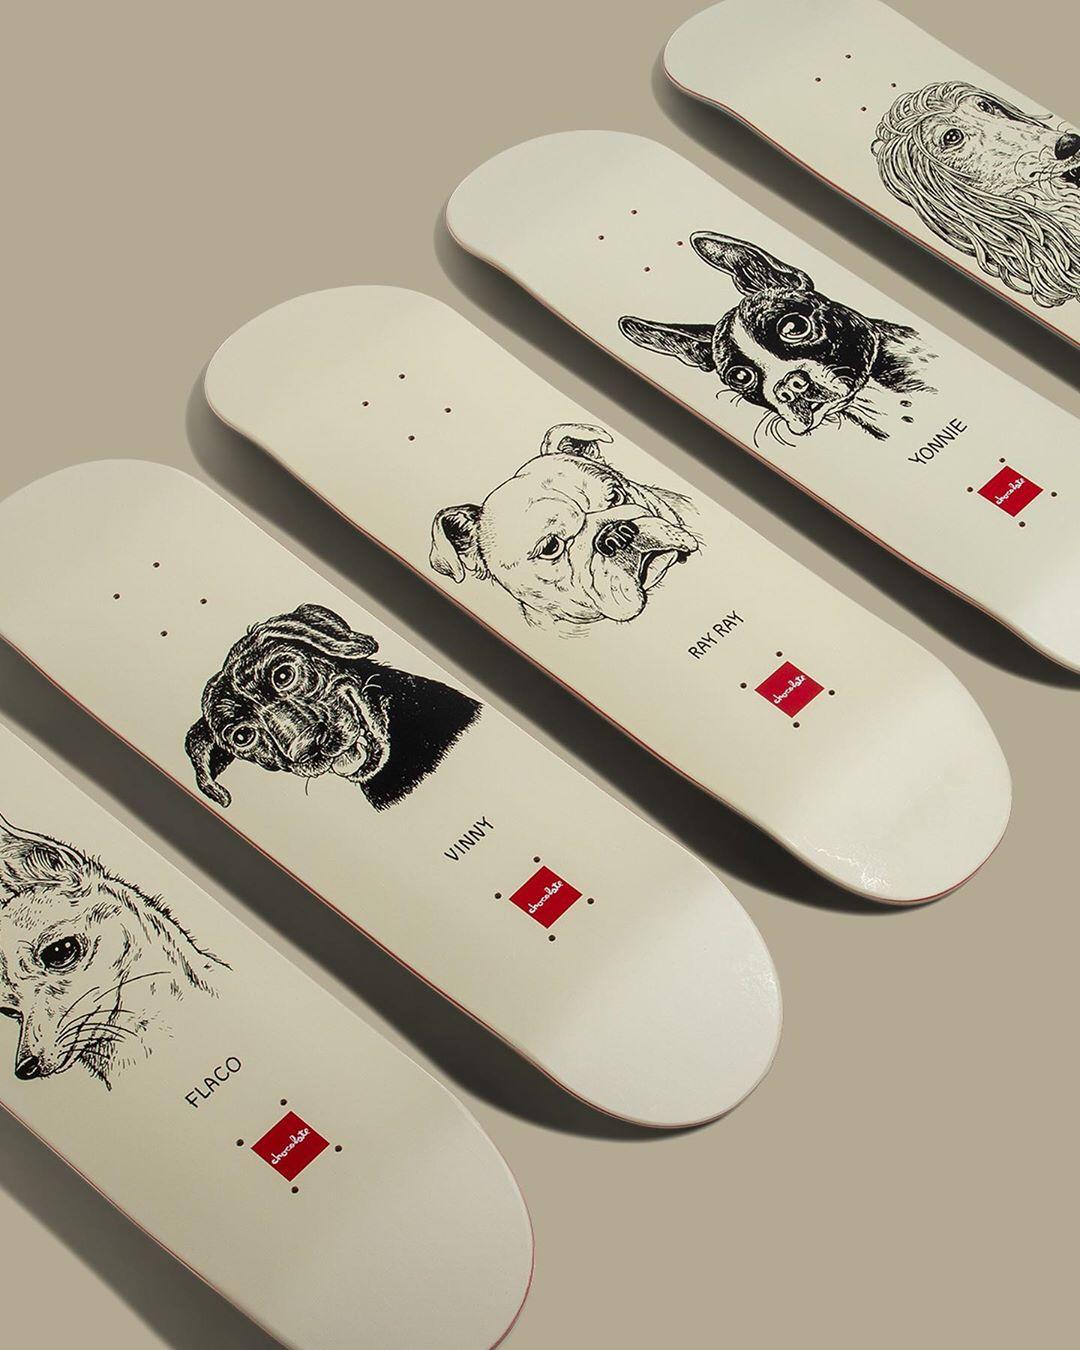 Big Dawgs Series By Travis Millard X Chocolate Skateboards 3.jpg